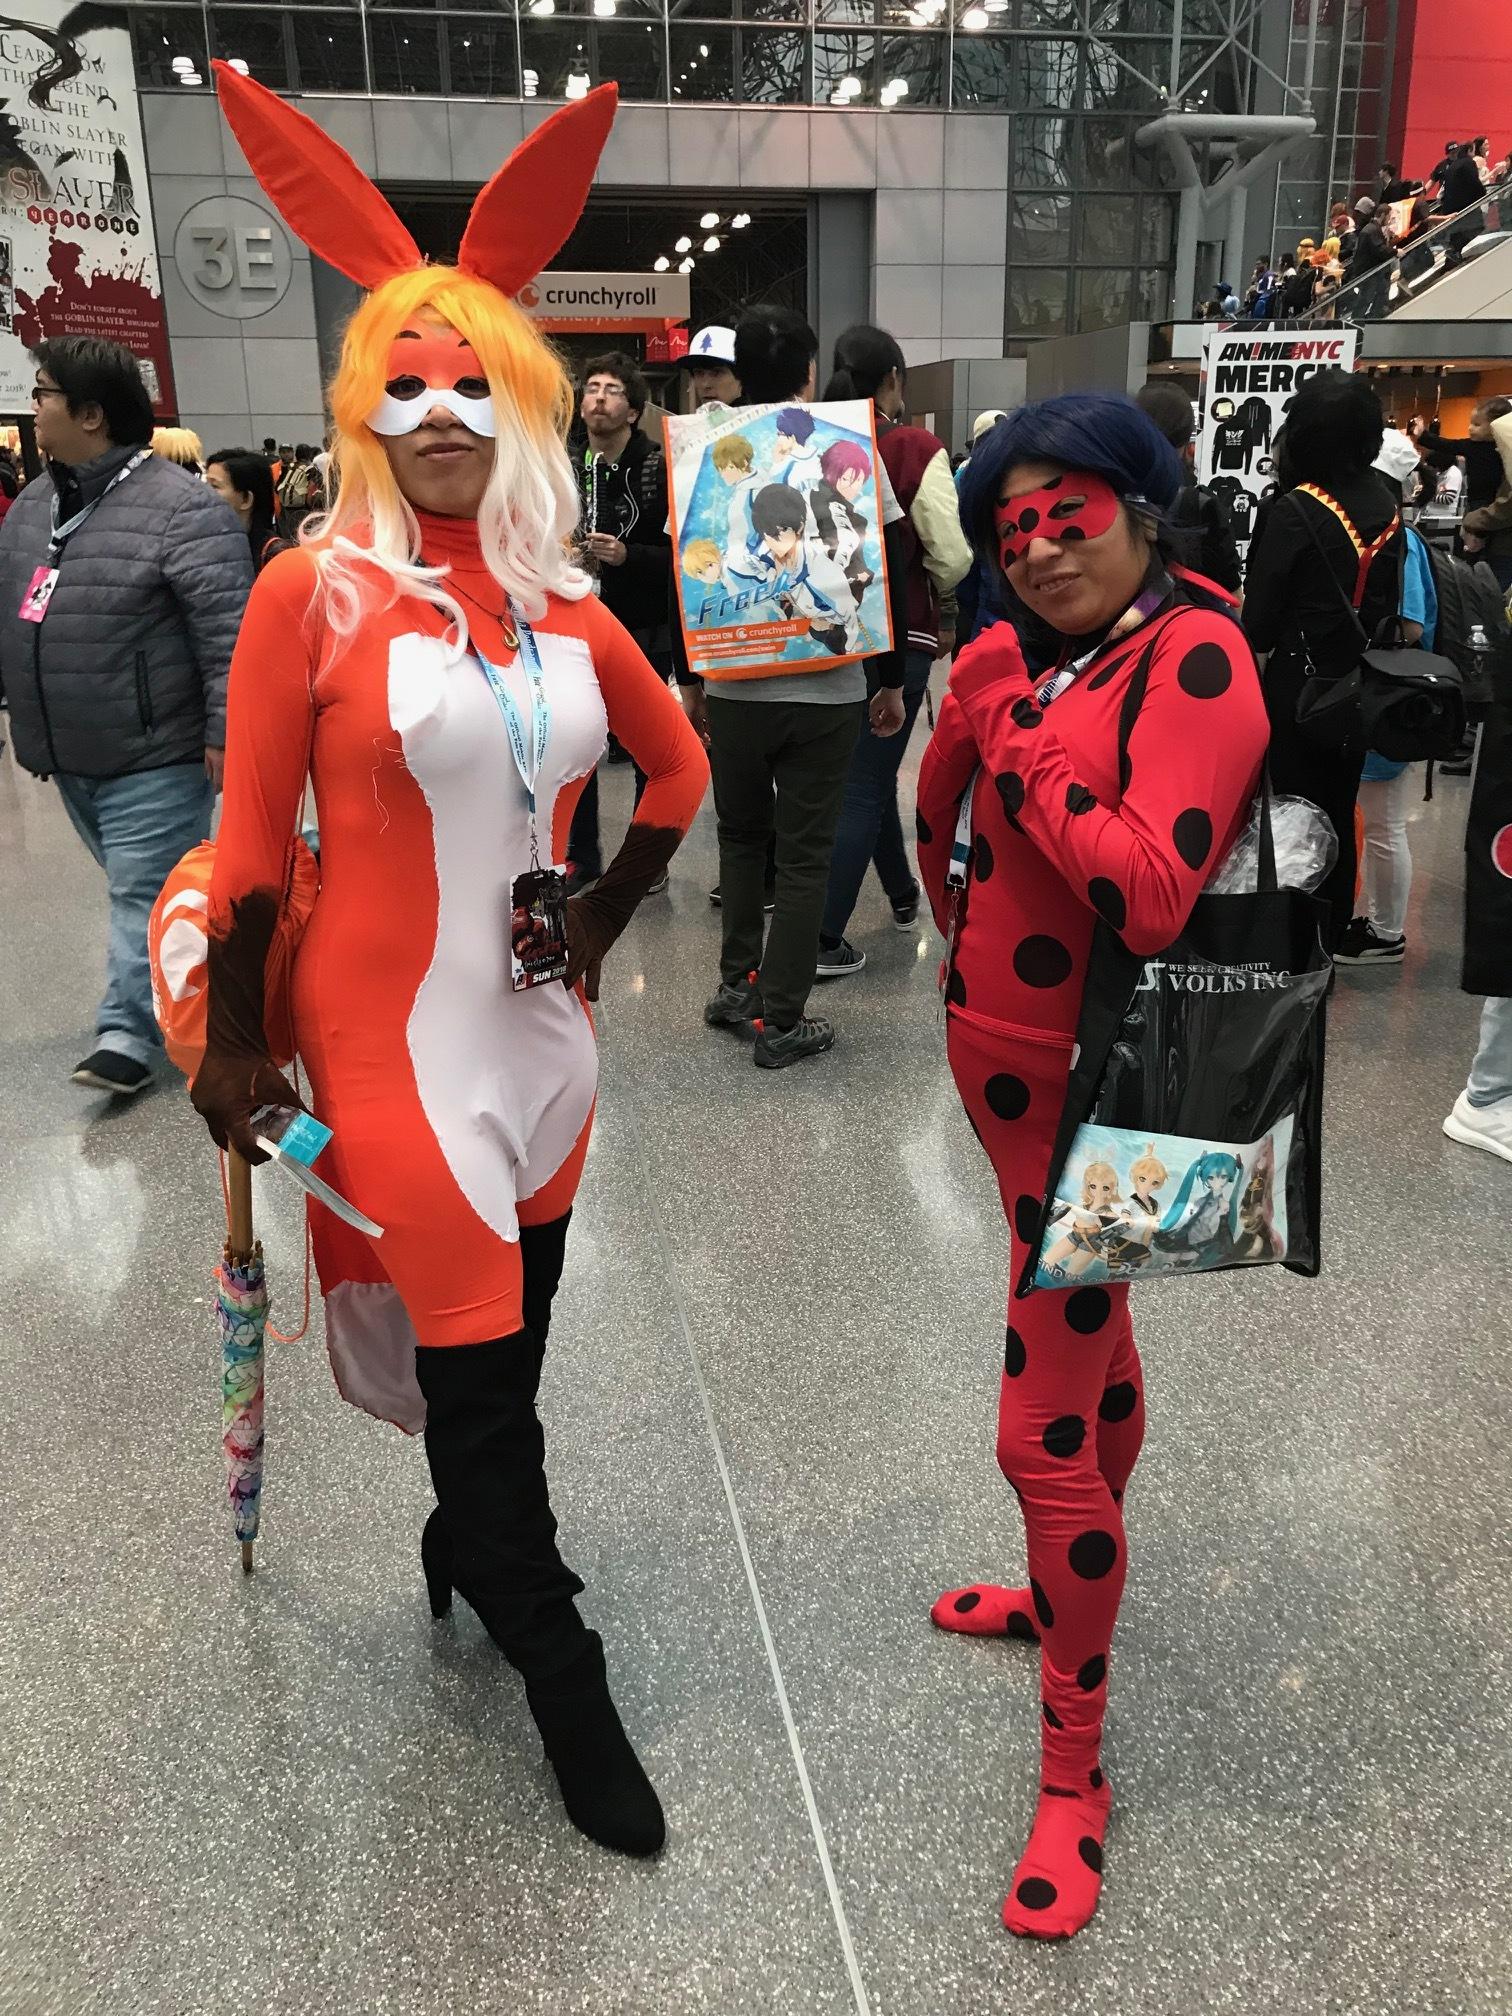 Rena Rogue aka Adriana Tumblr: @chibiana26 and Ladybug aka Minnie Facebook: Minnie Gaytan